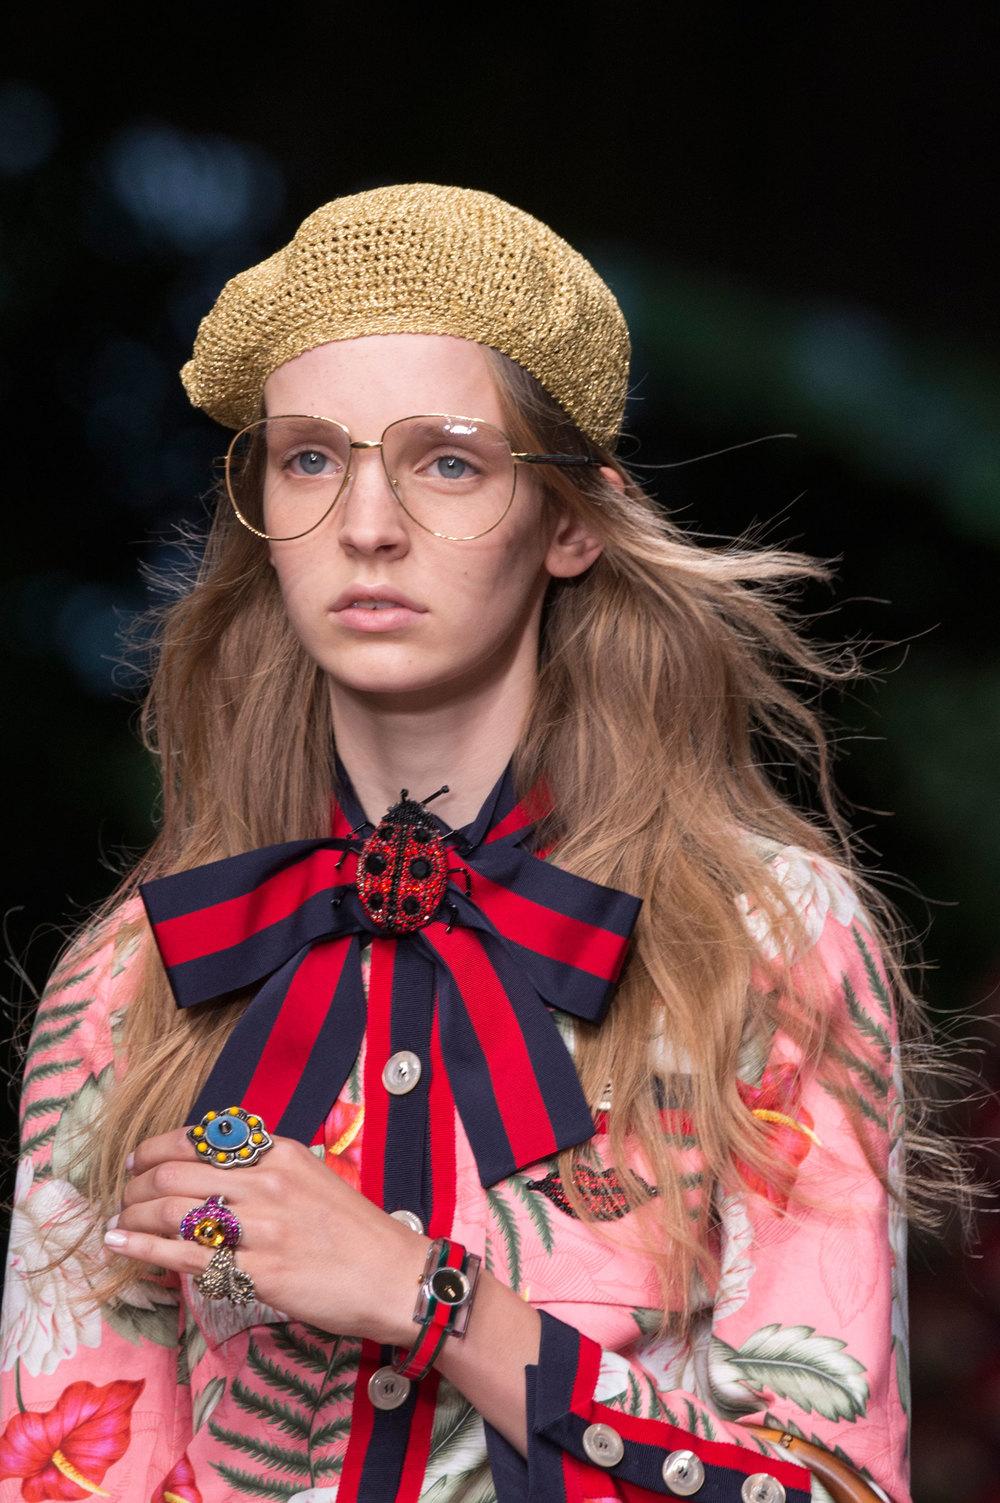 65515-gucci-beauty-spring-2016-fashion-show-the-impression-023.jpg